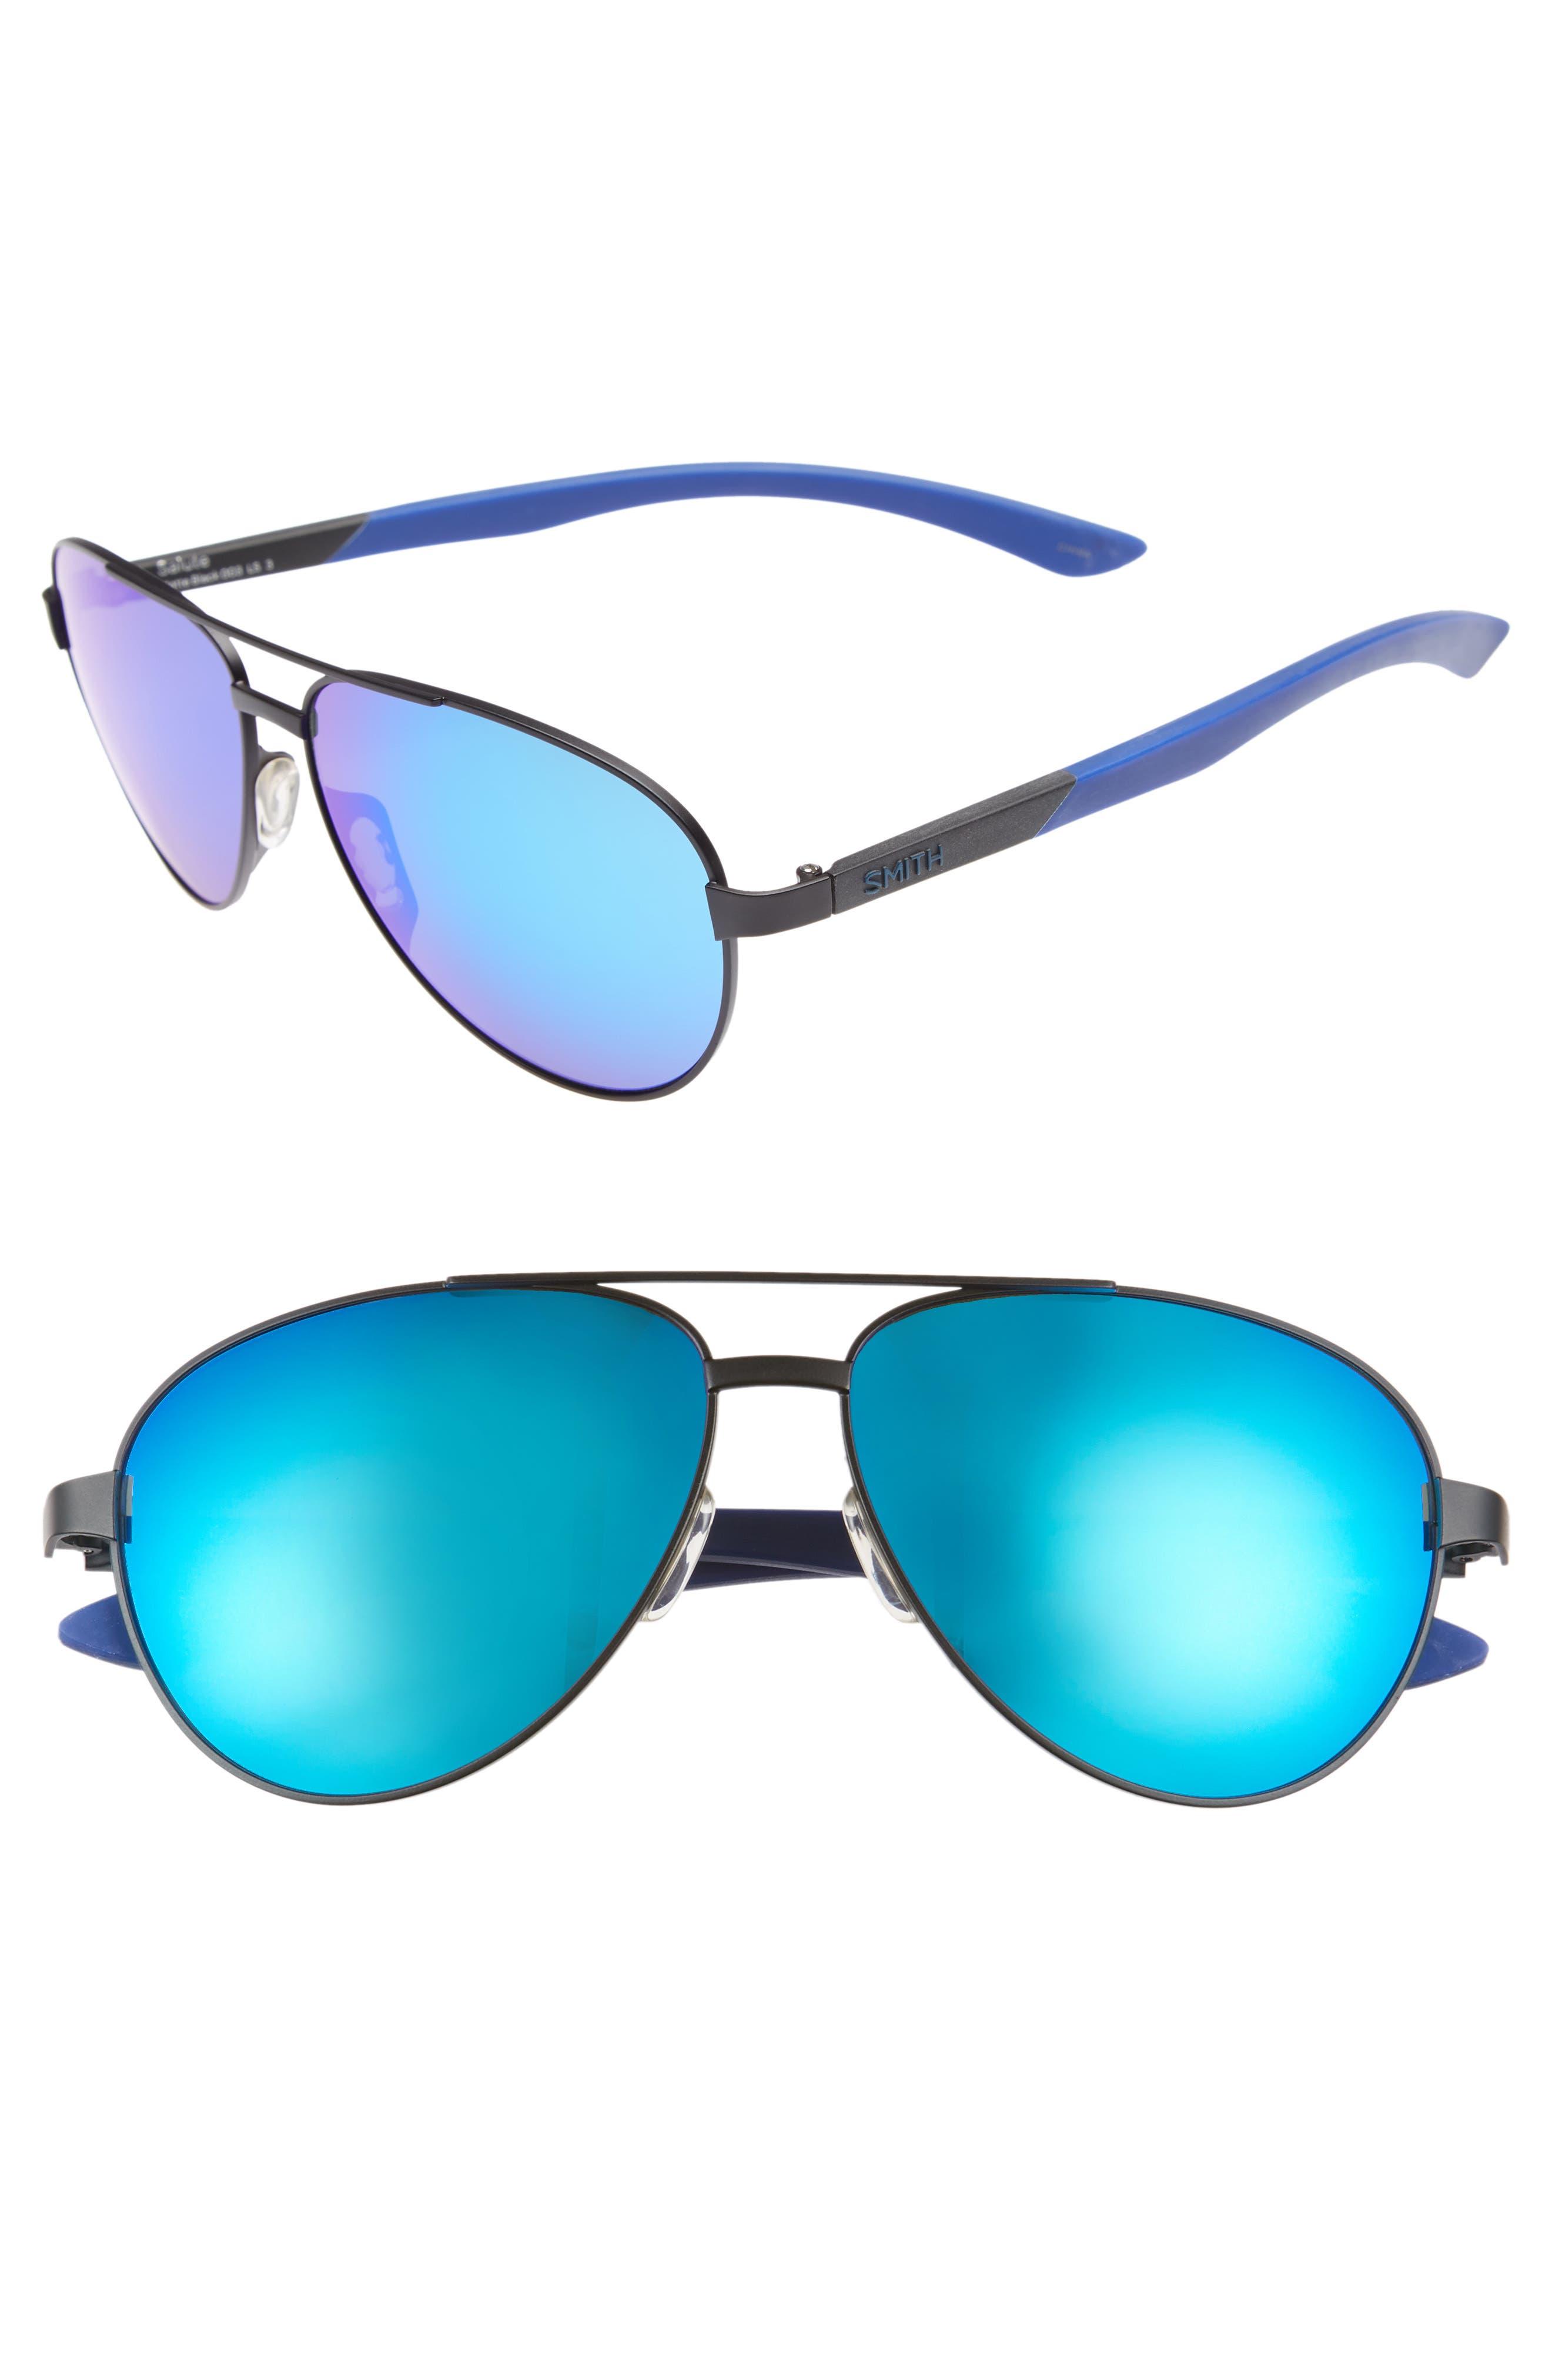 Salute 59mm Aviator Sunglasses,                             Main thumbnail 1, color,                             Matte Black